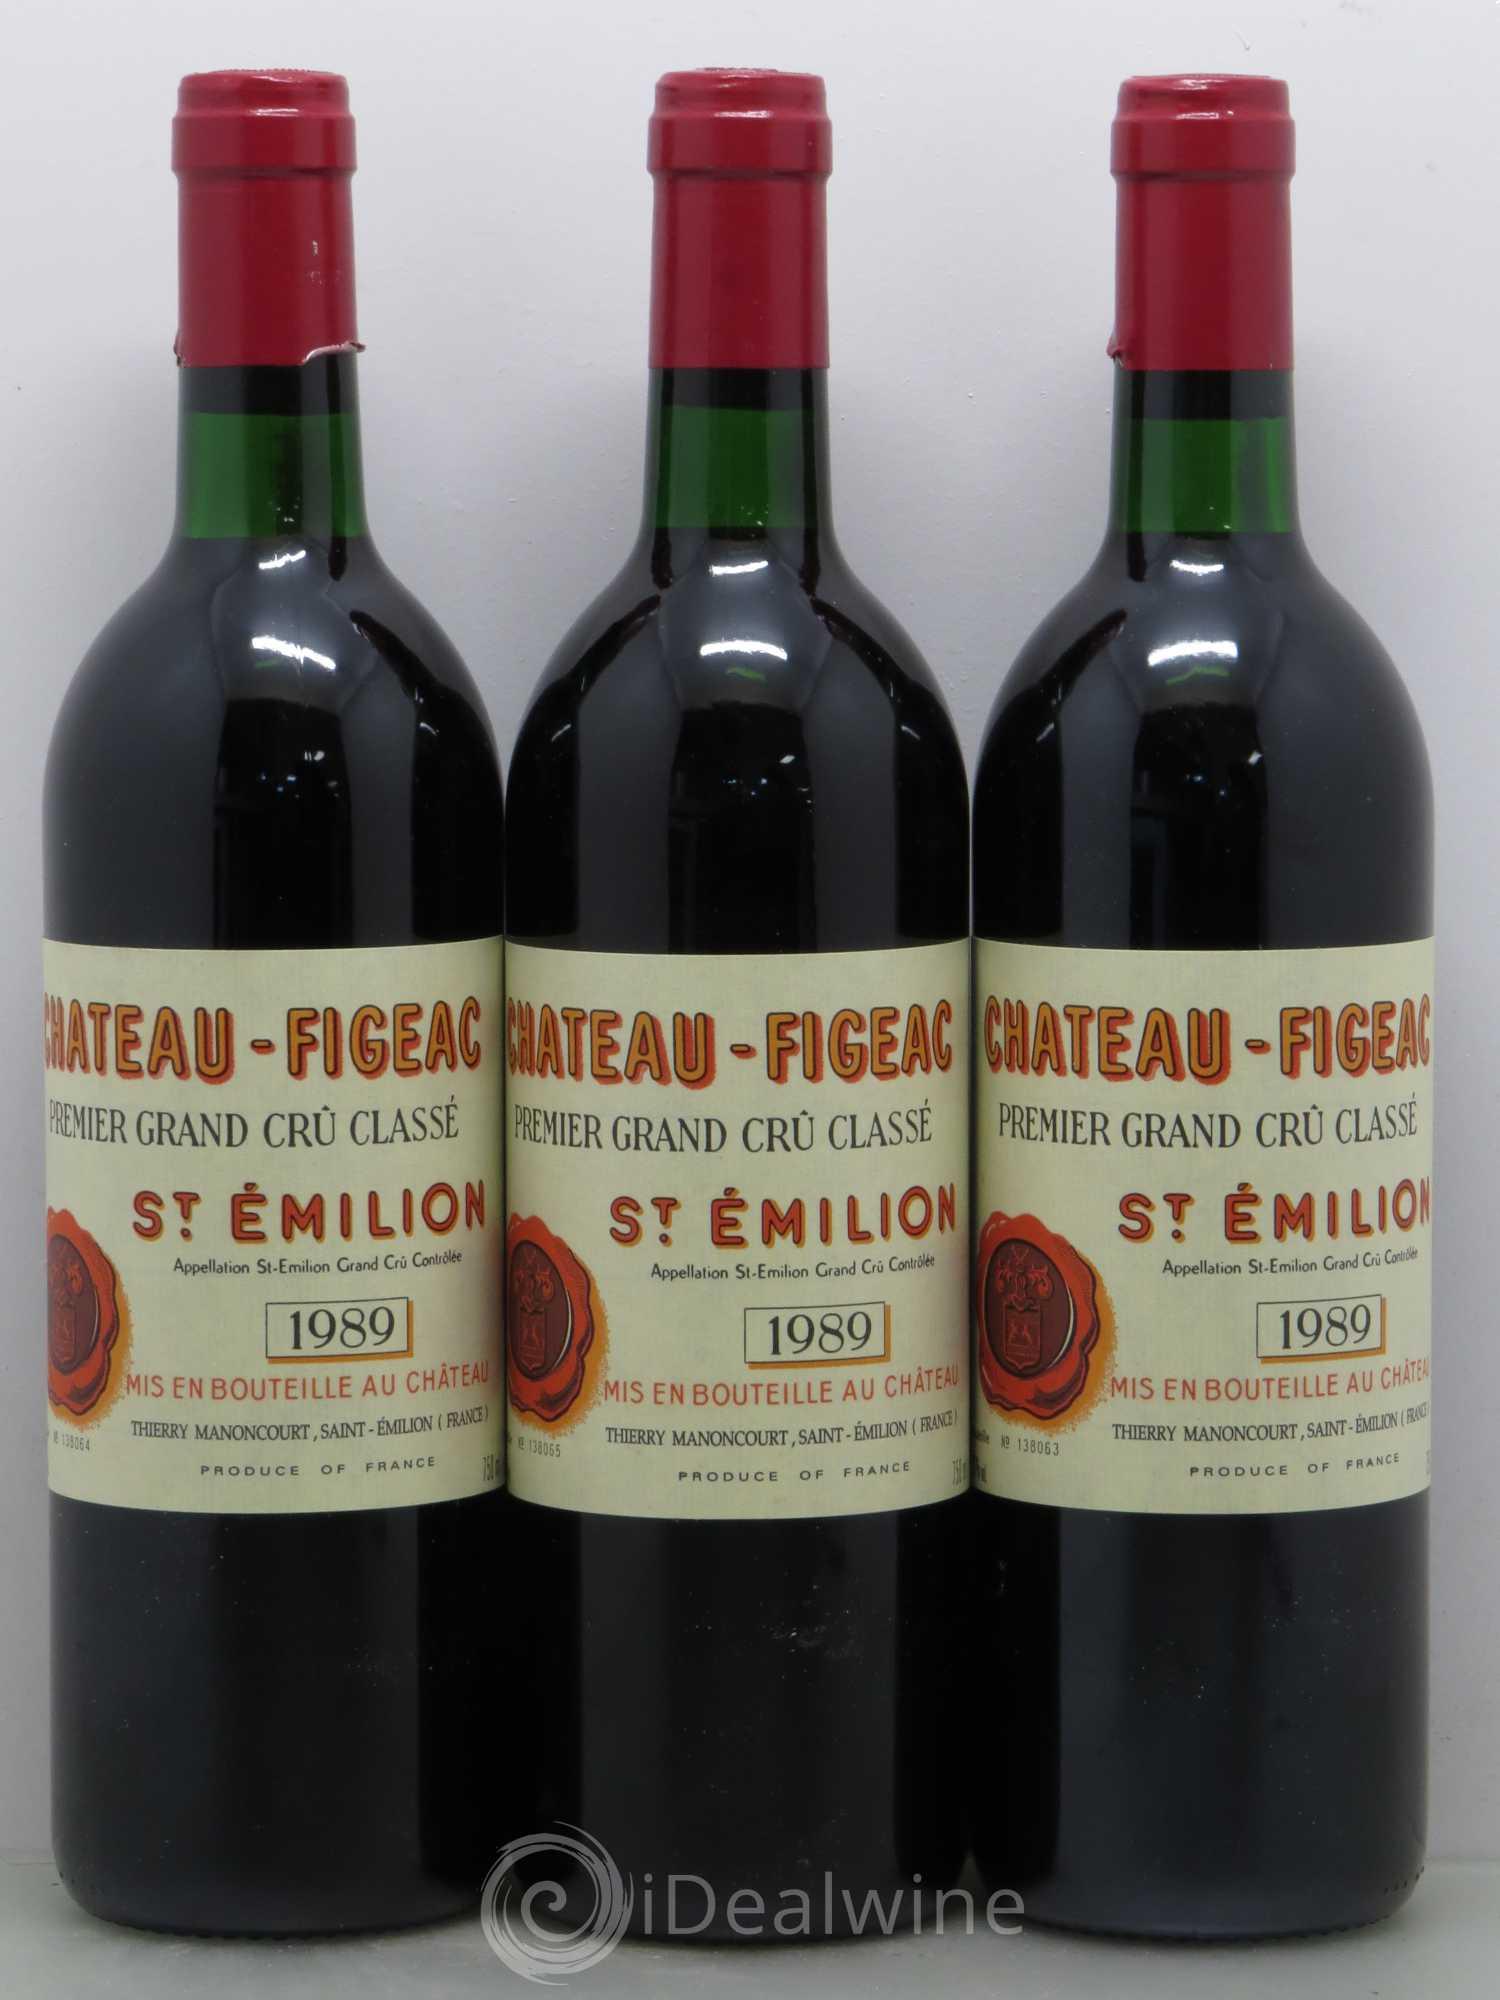 Buy ch teau figeac 1er grand cru class b 1989 lot 8555 for Buy chateaubriand